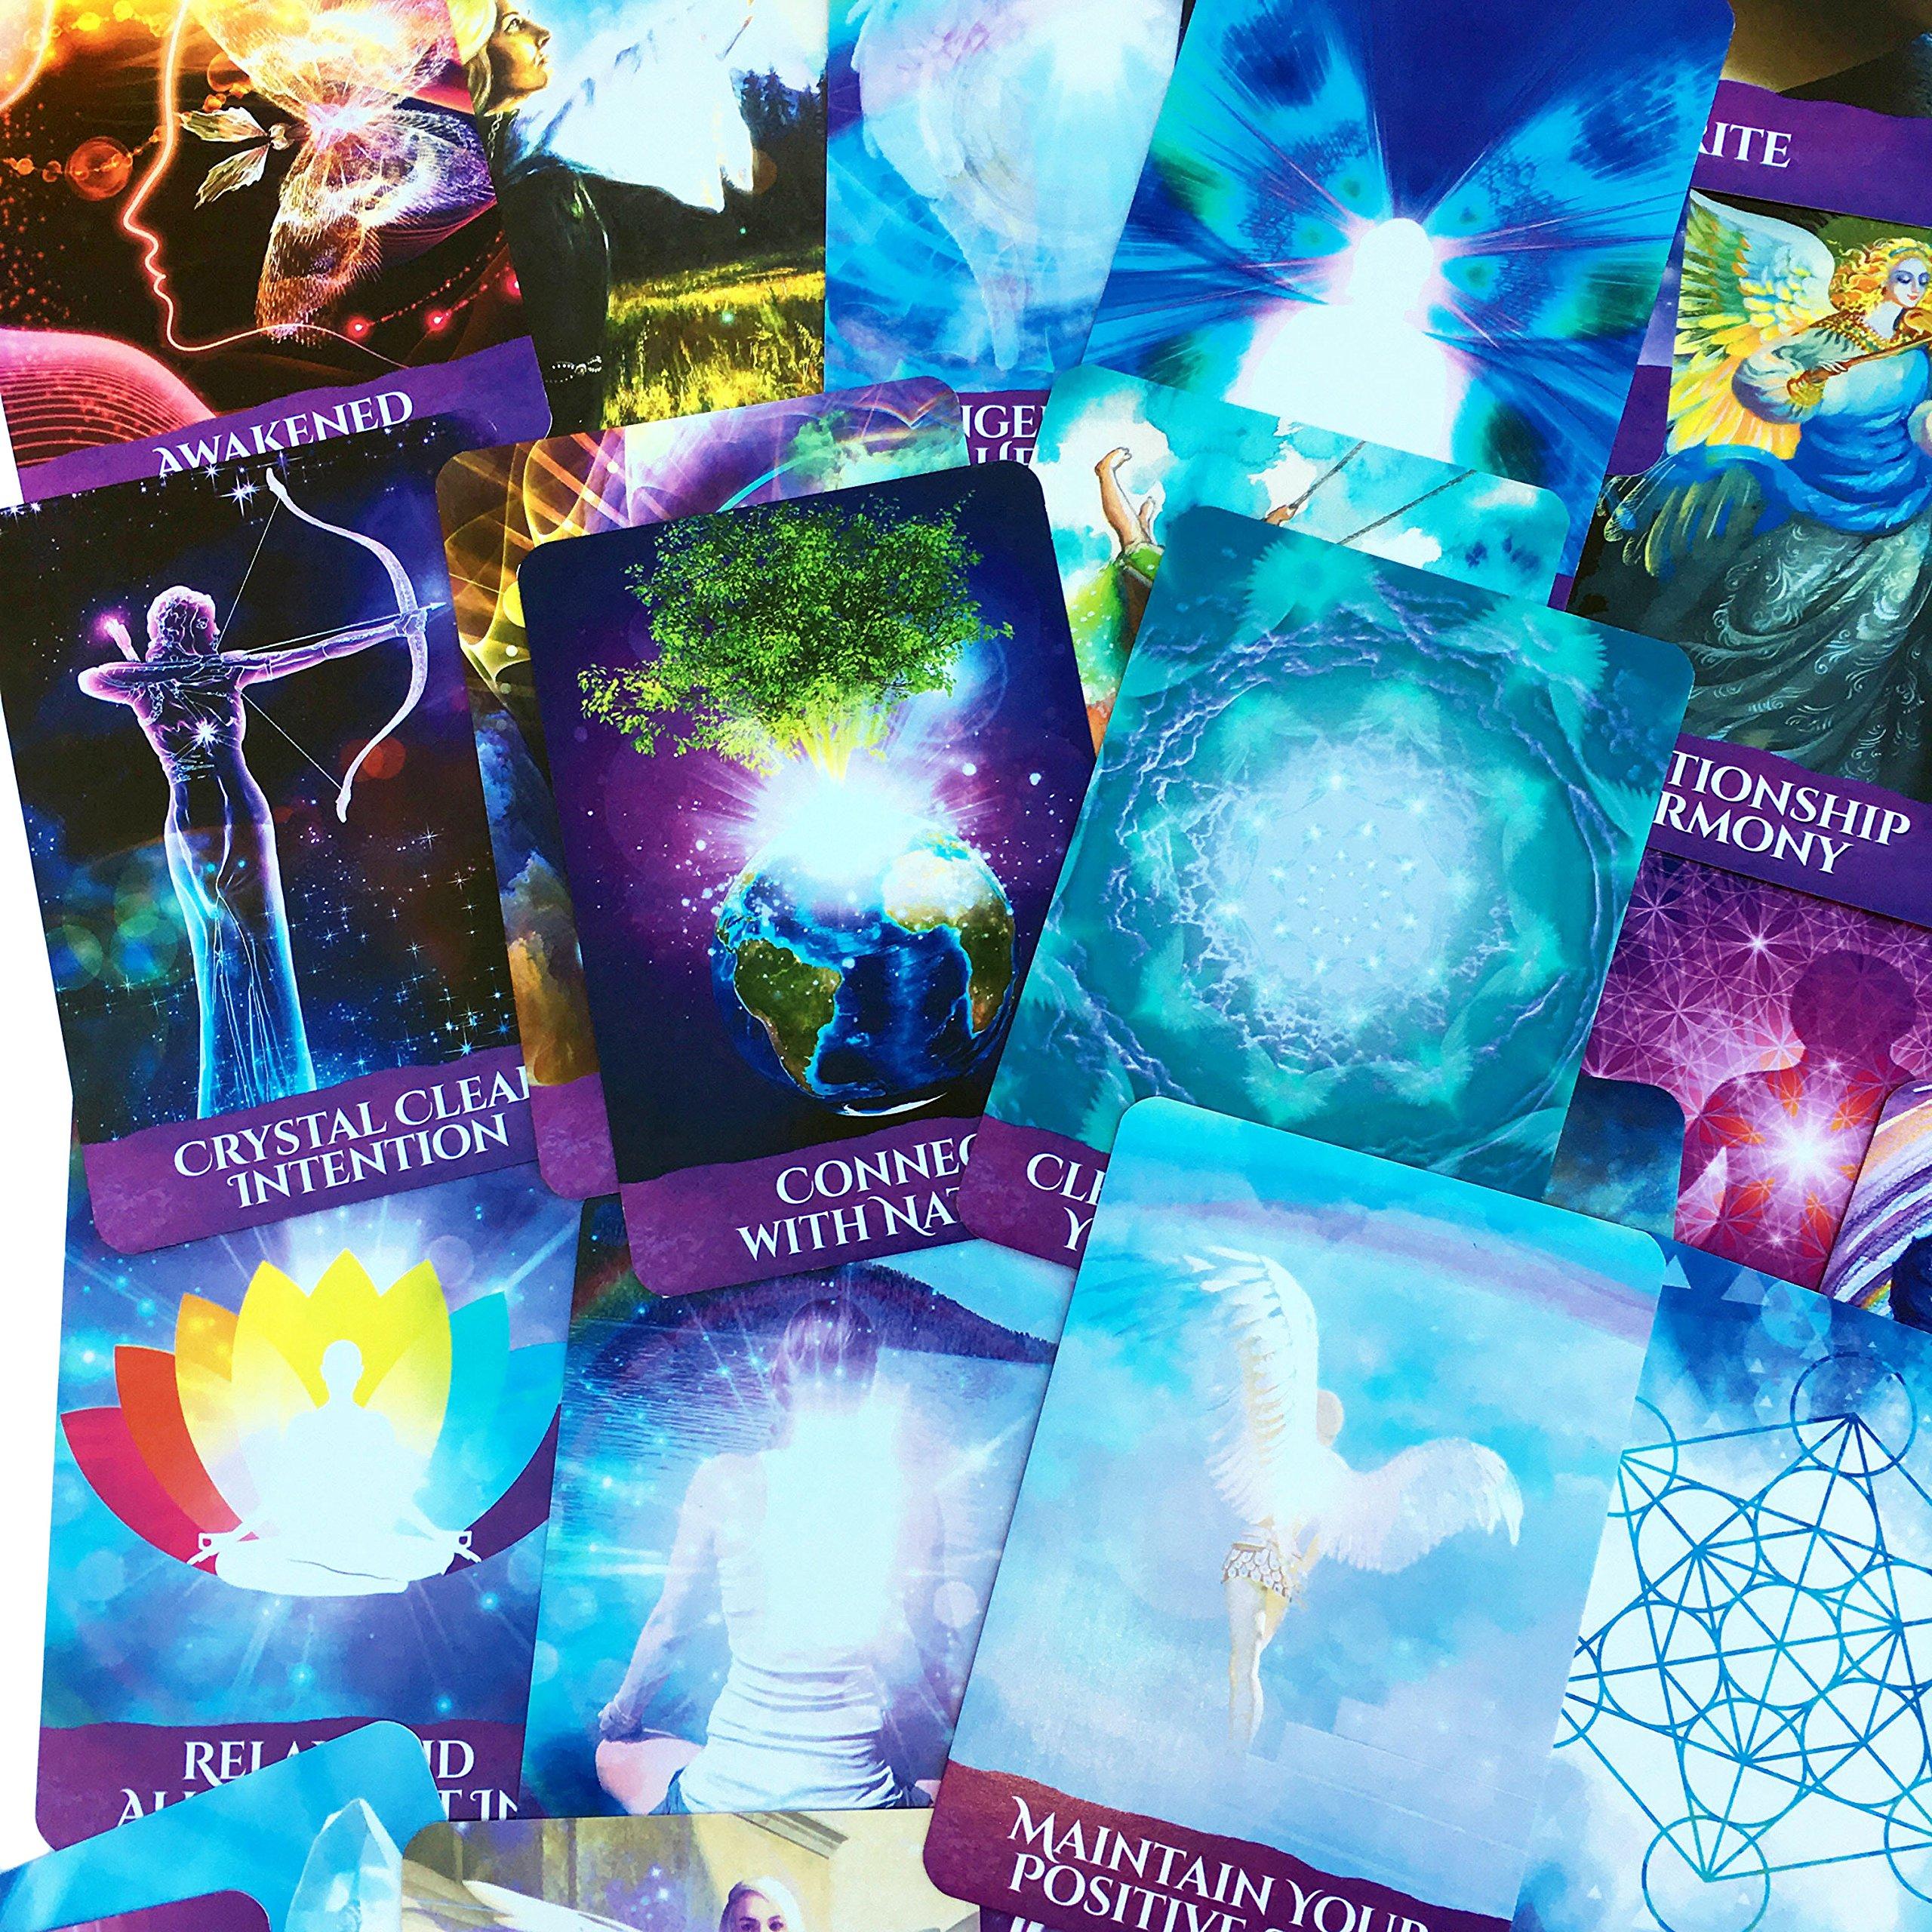 Ascension Angel Cards: Melanie Beckler: 9781946208774: Amazon.com: Books